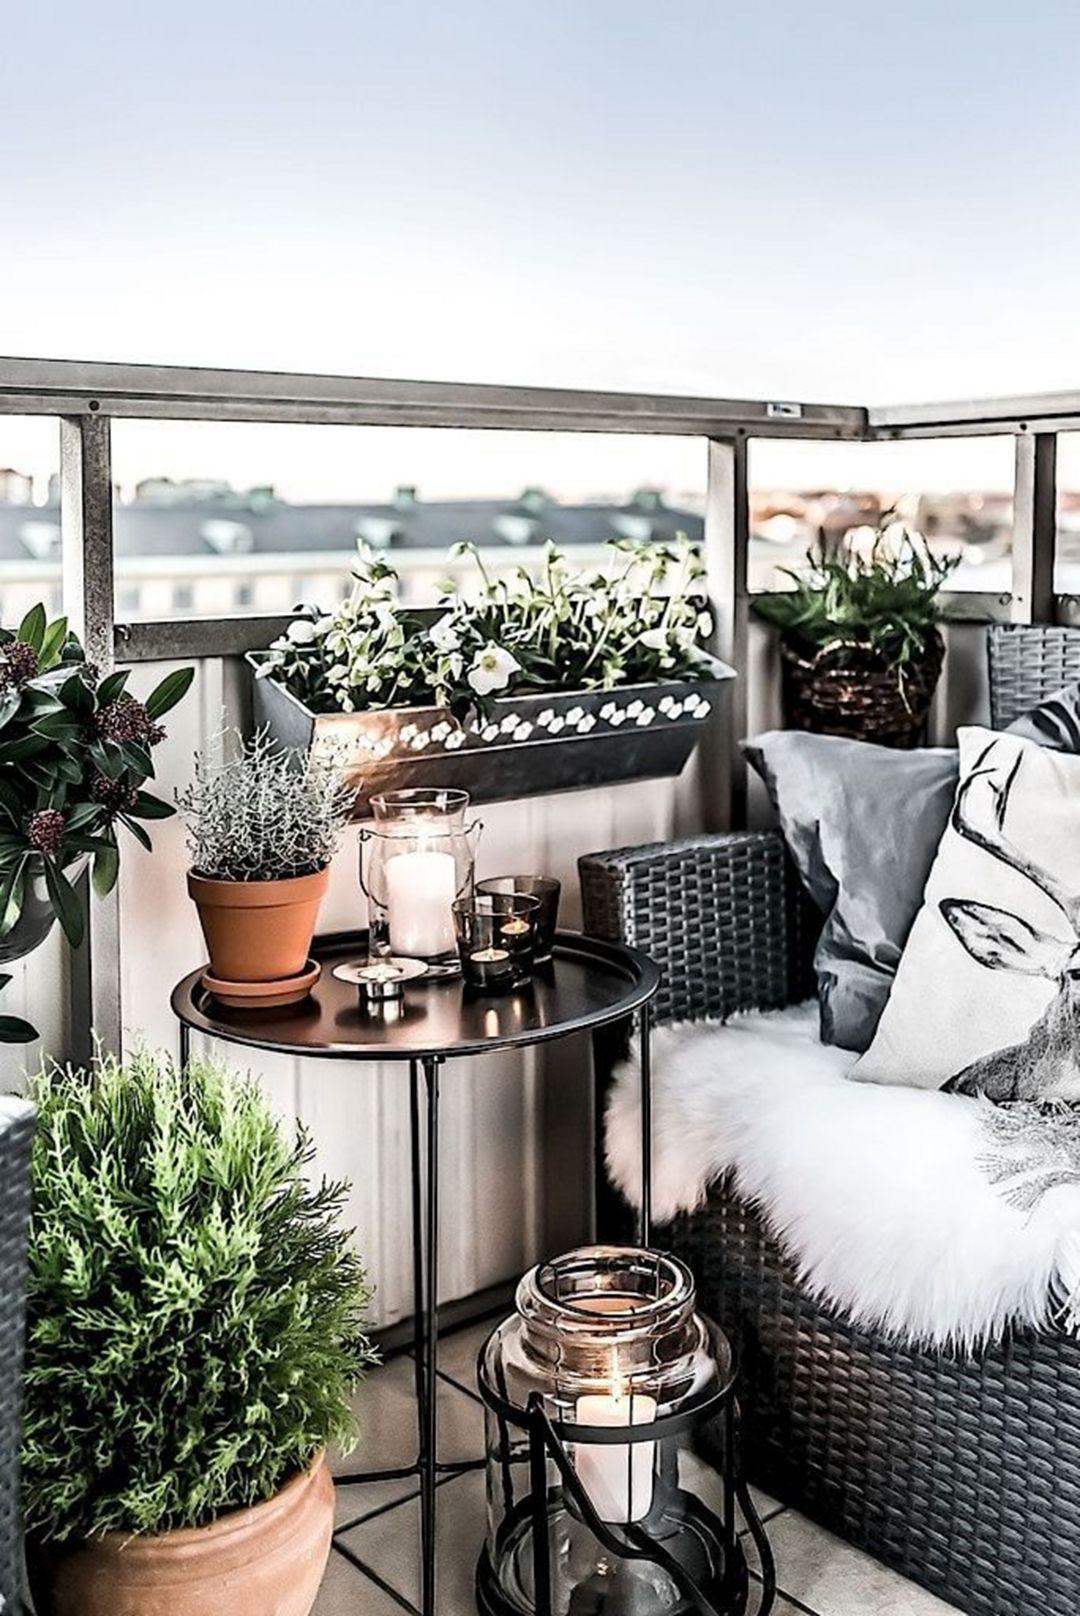 17 Cozy Apartment Balcony Ideas and Decor Inspiration  Small